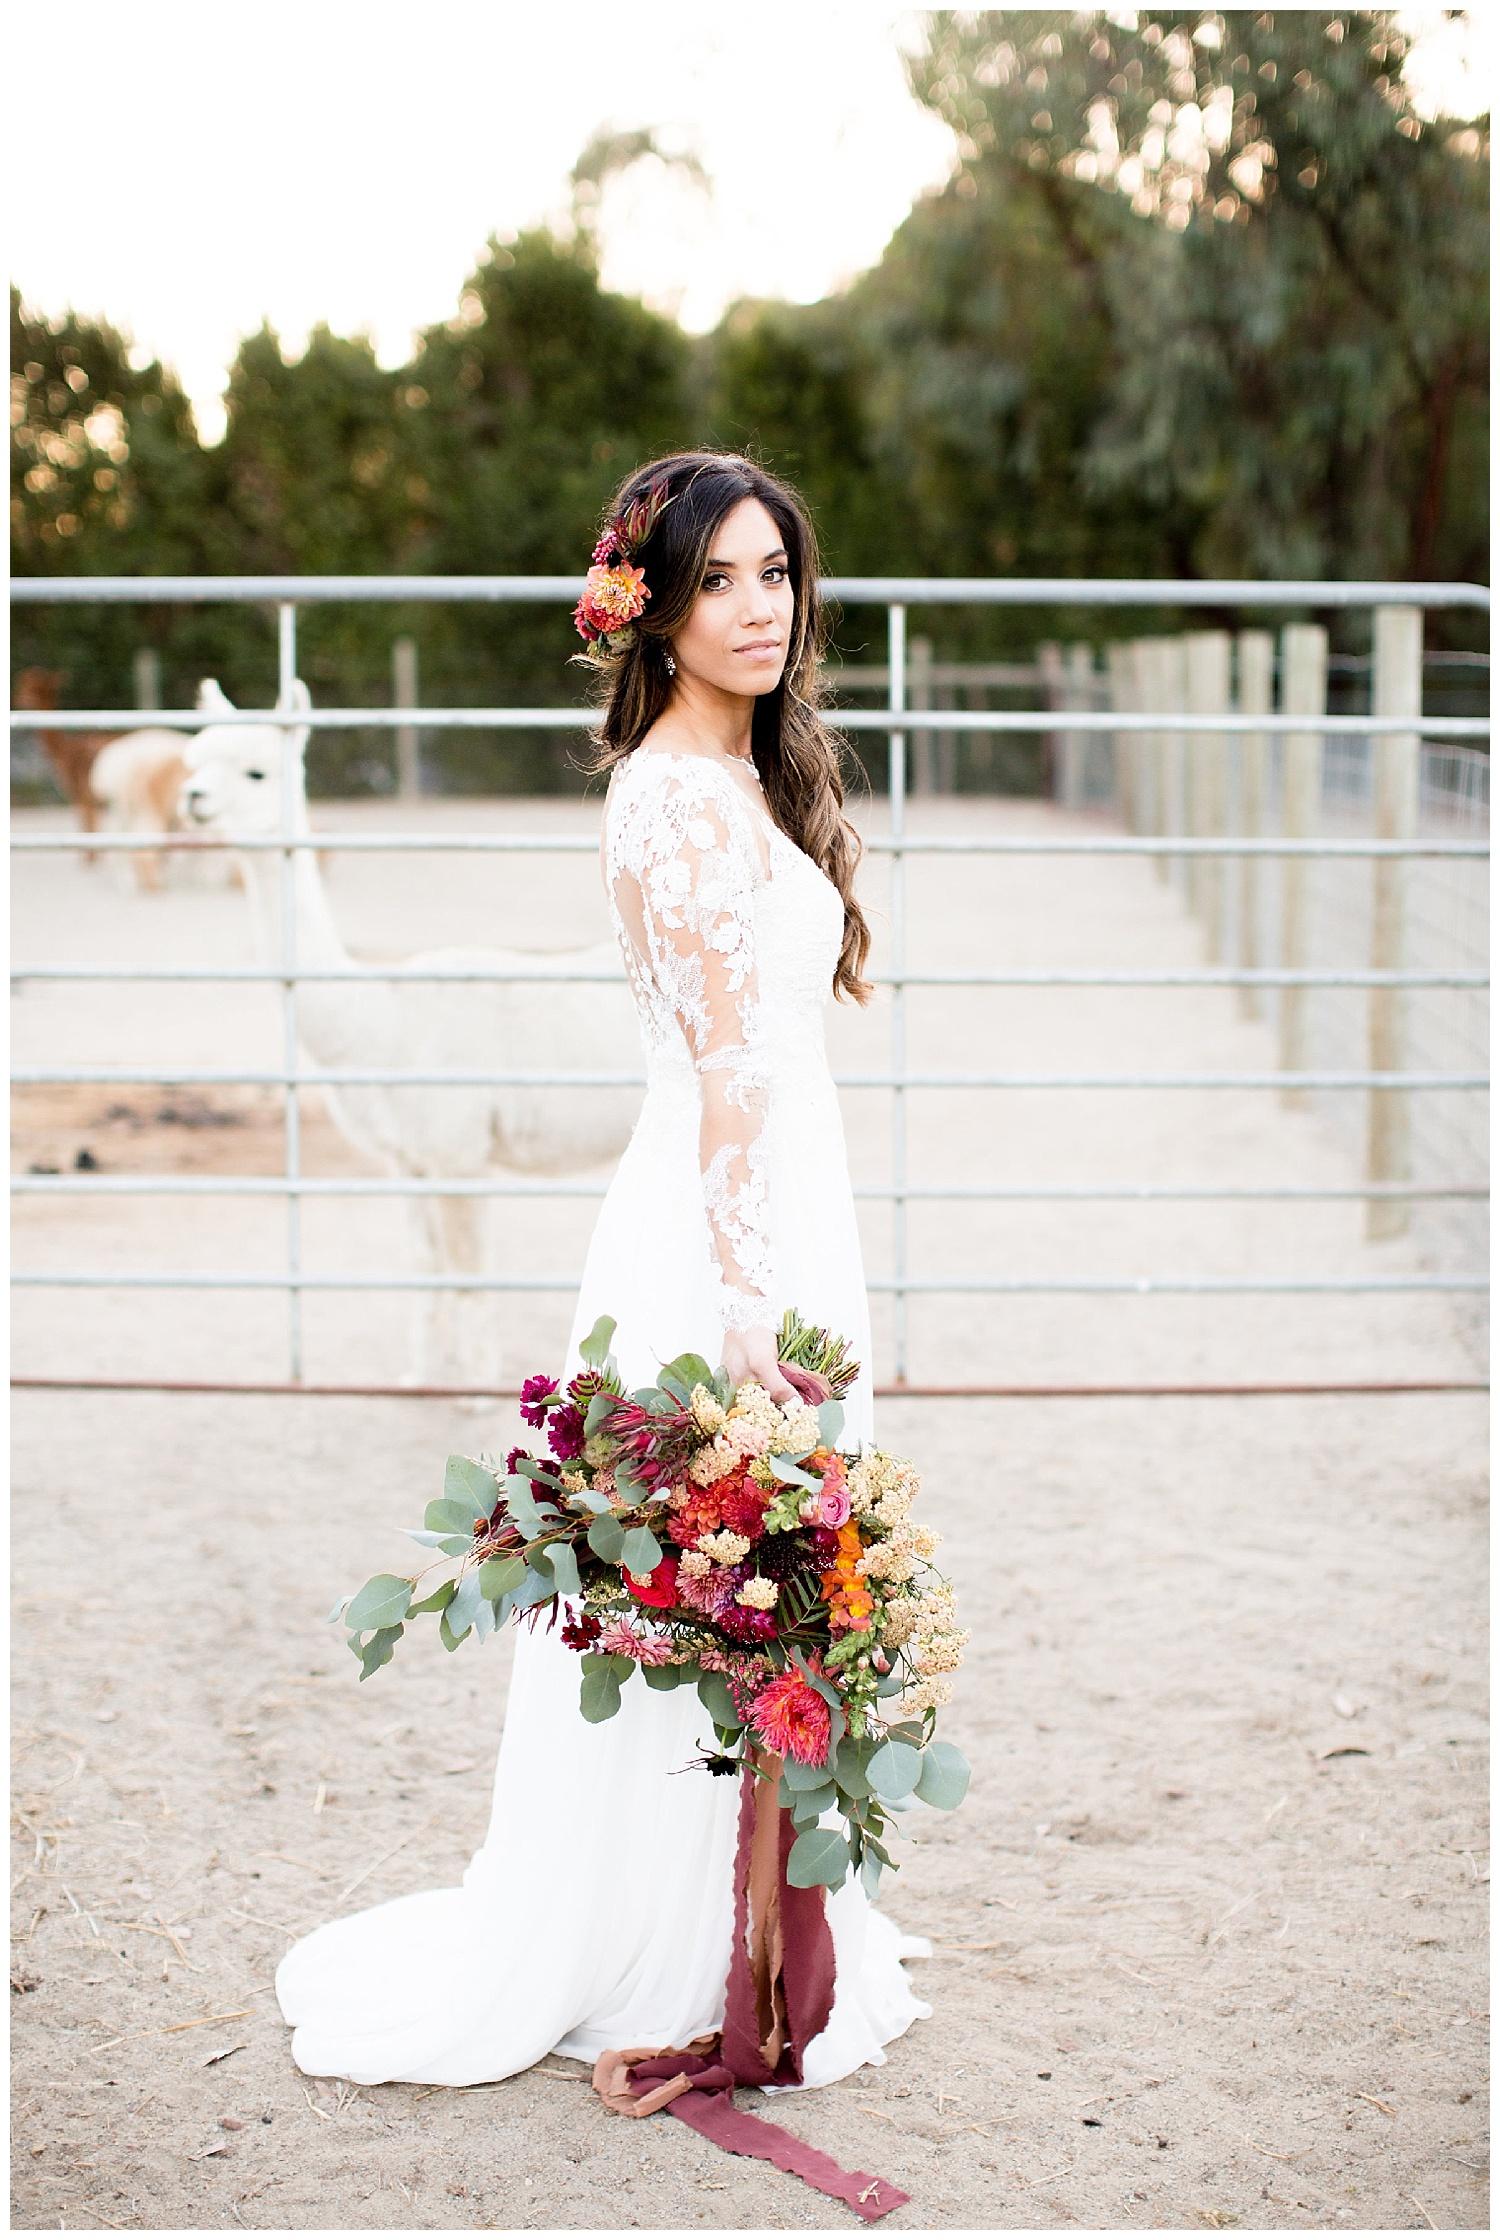 de joy photography pronovias bride 2018